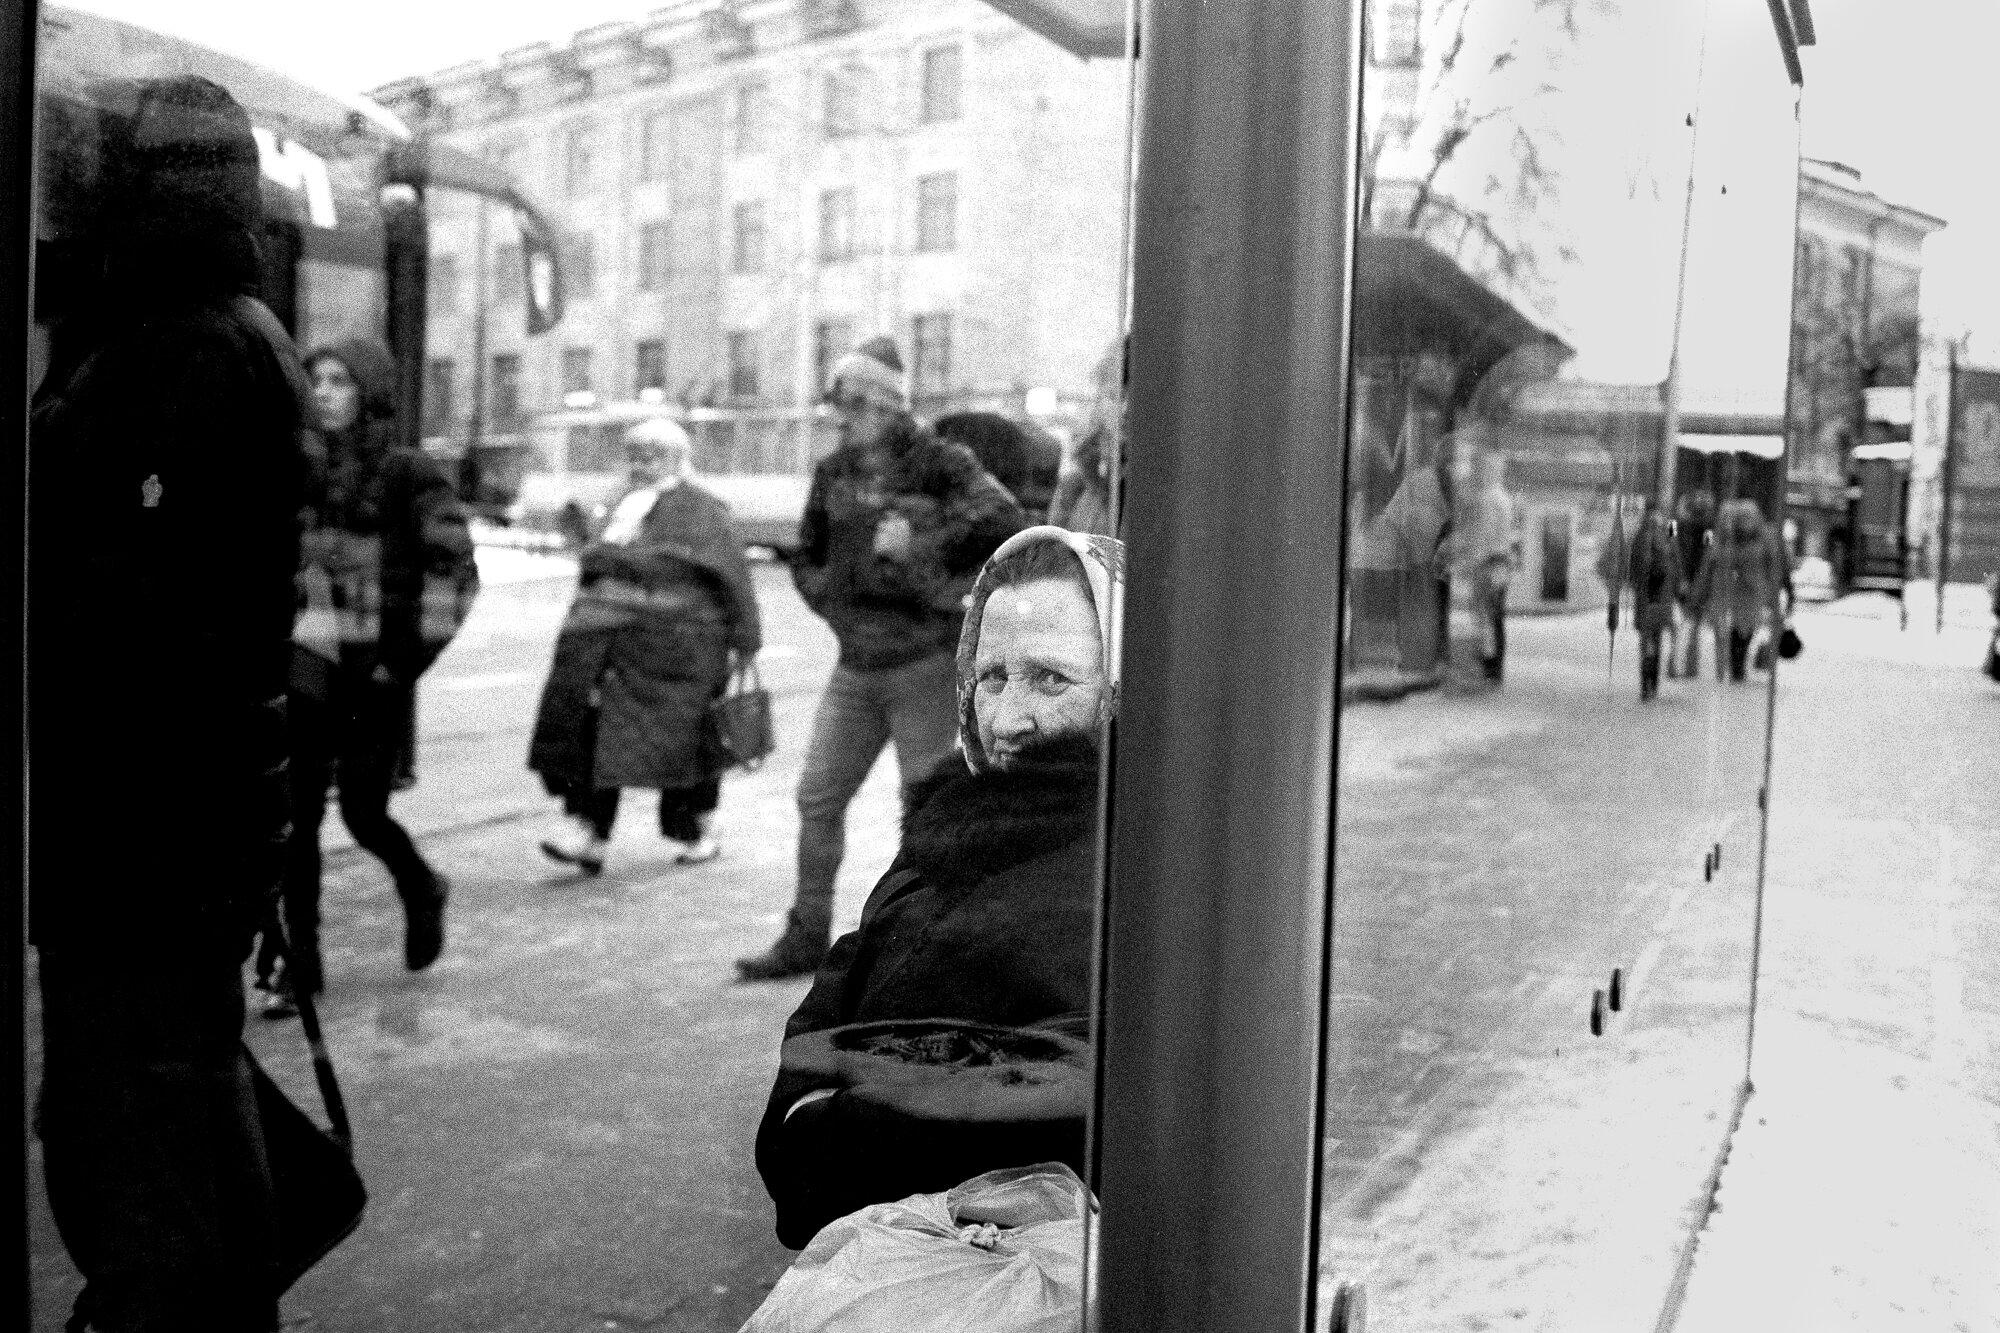 Ignas_Winter-4.jpg